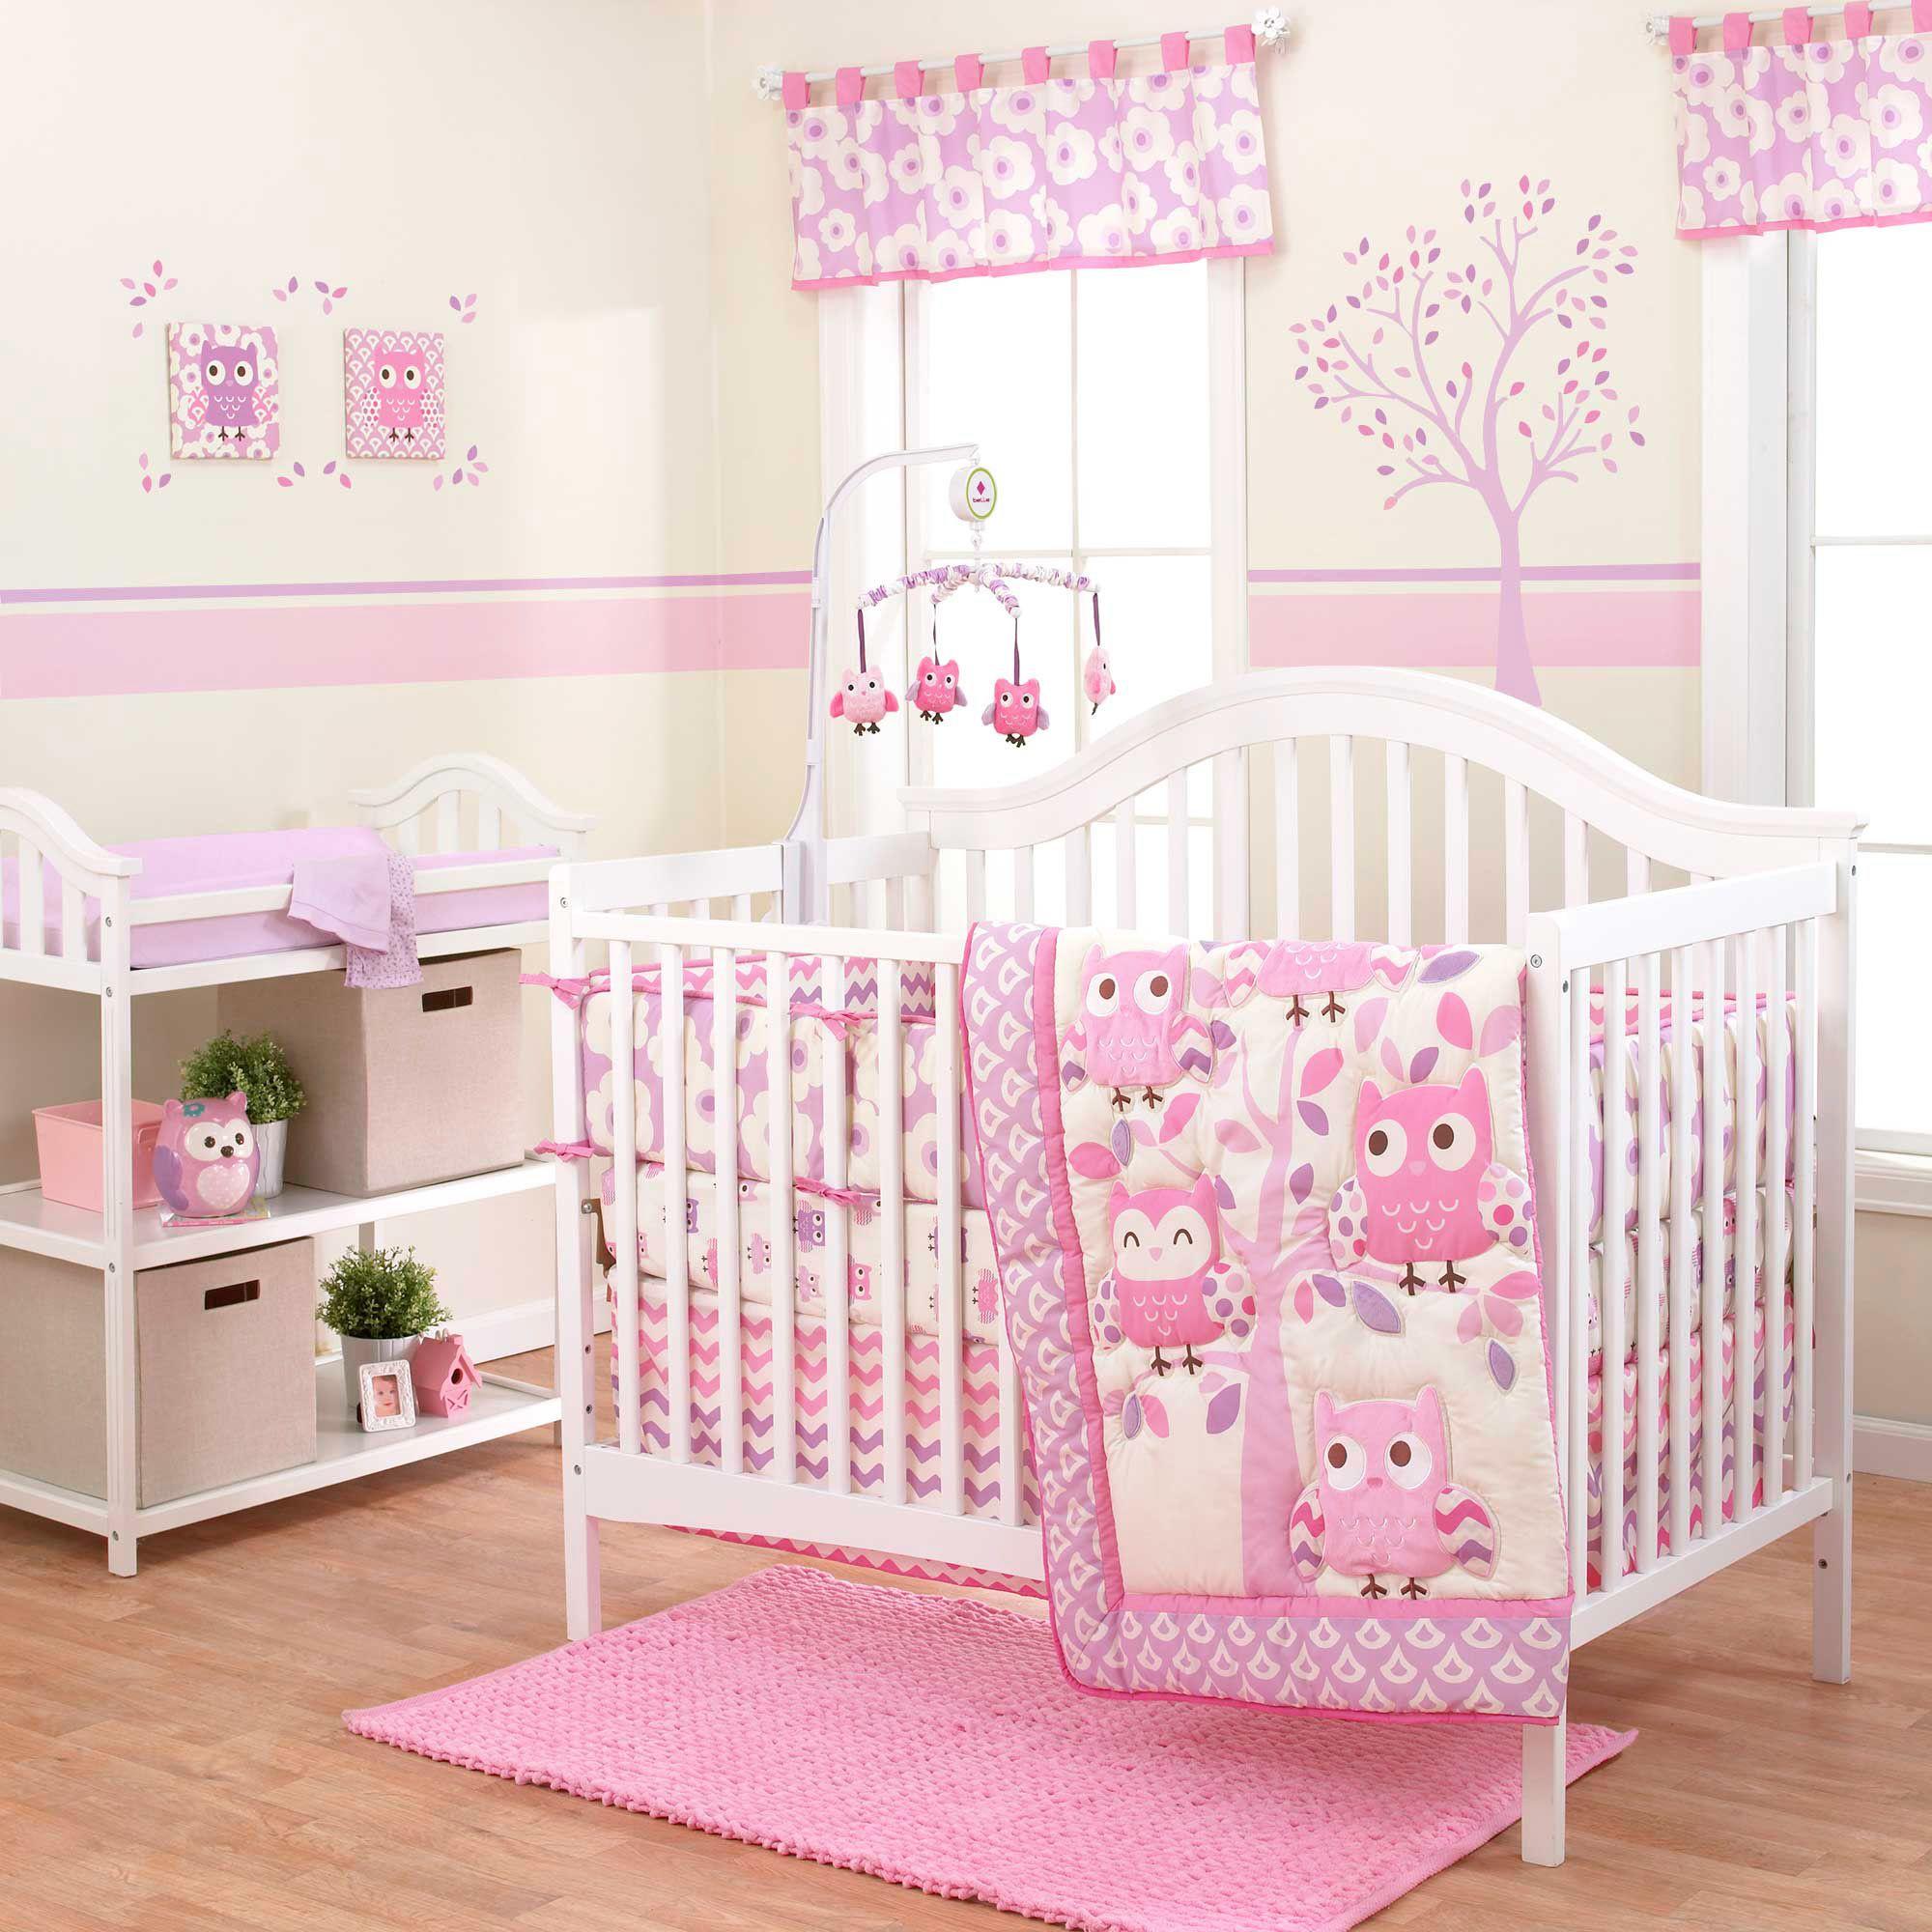 Dancing Owls Bedding By Belle Owl Baby Crib Bsbldo Set